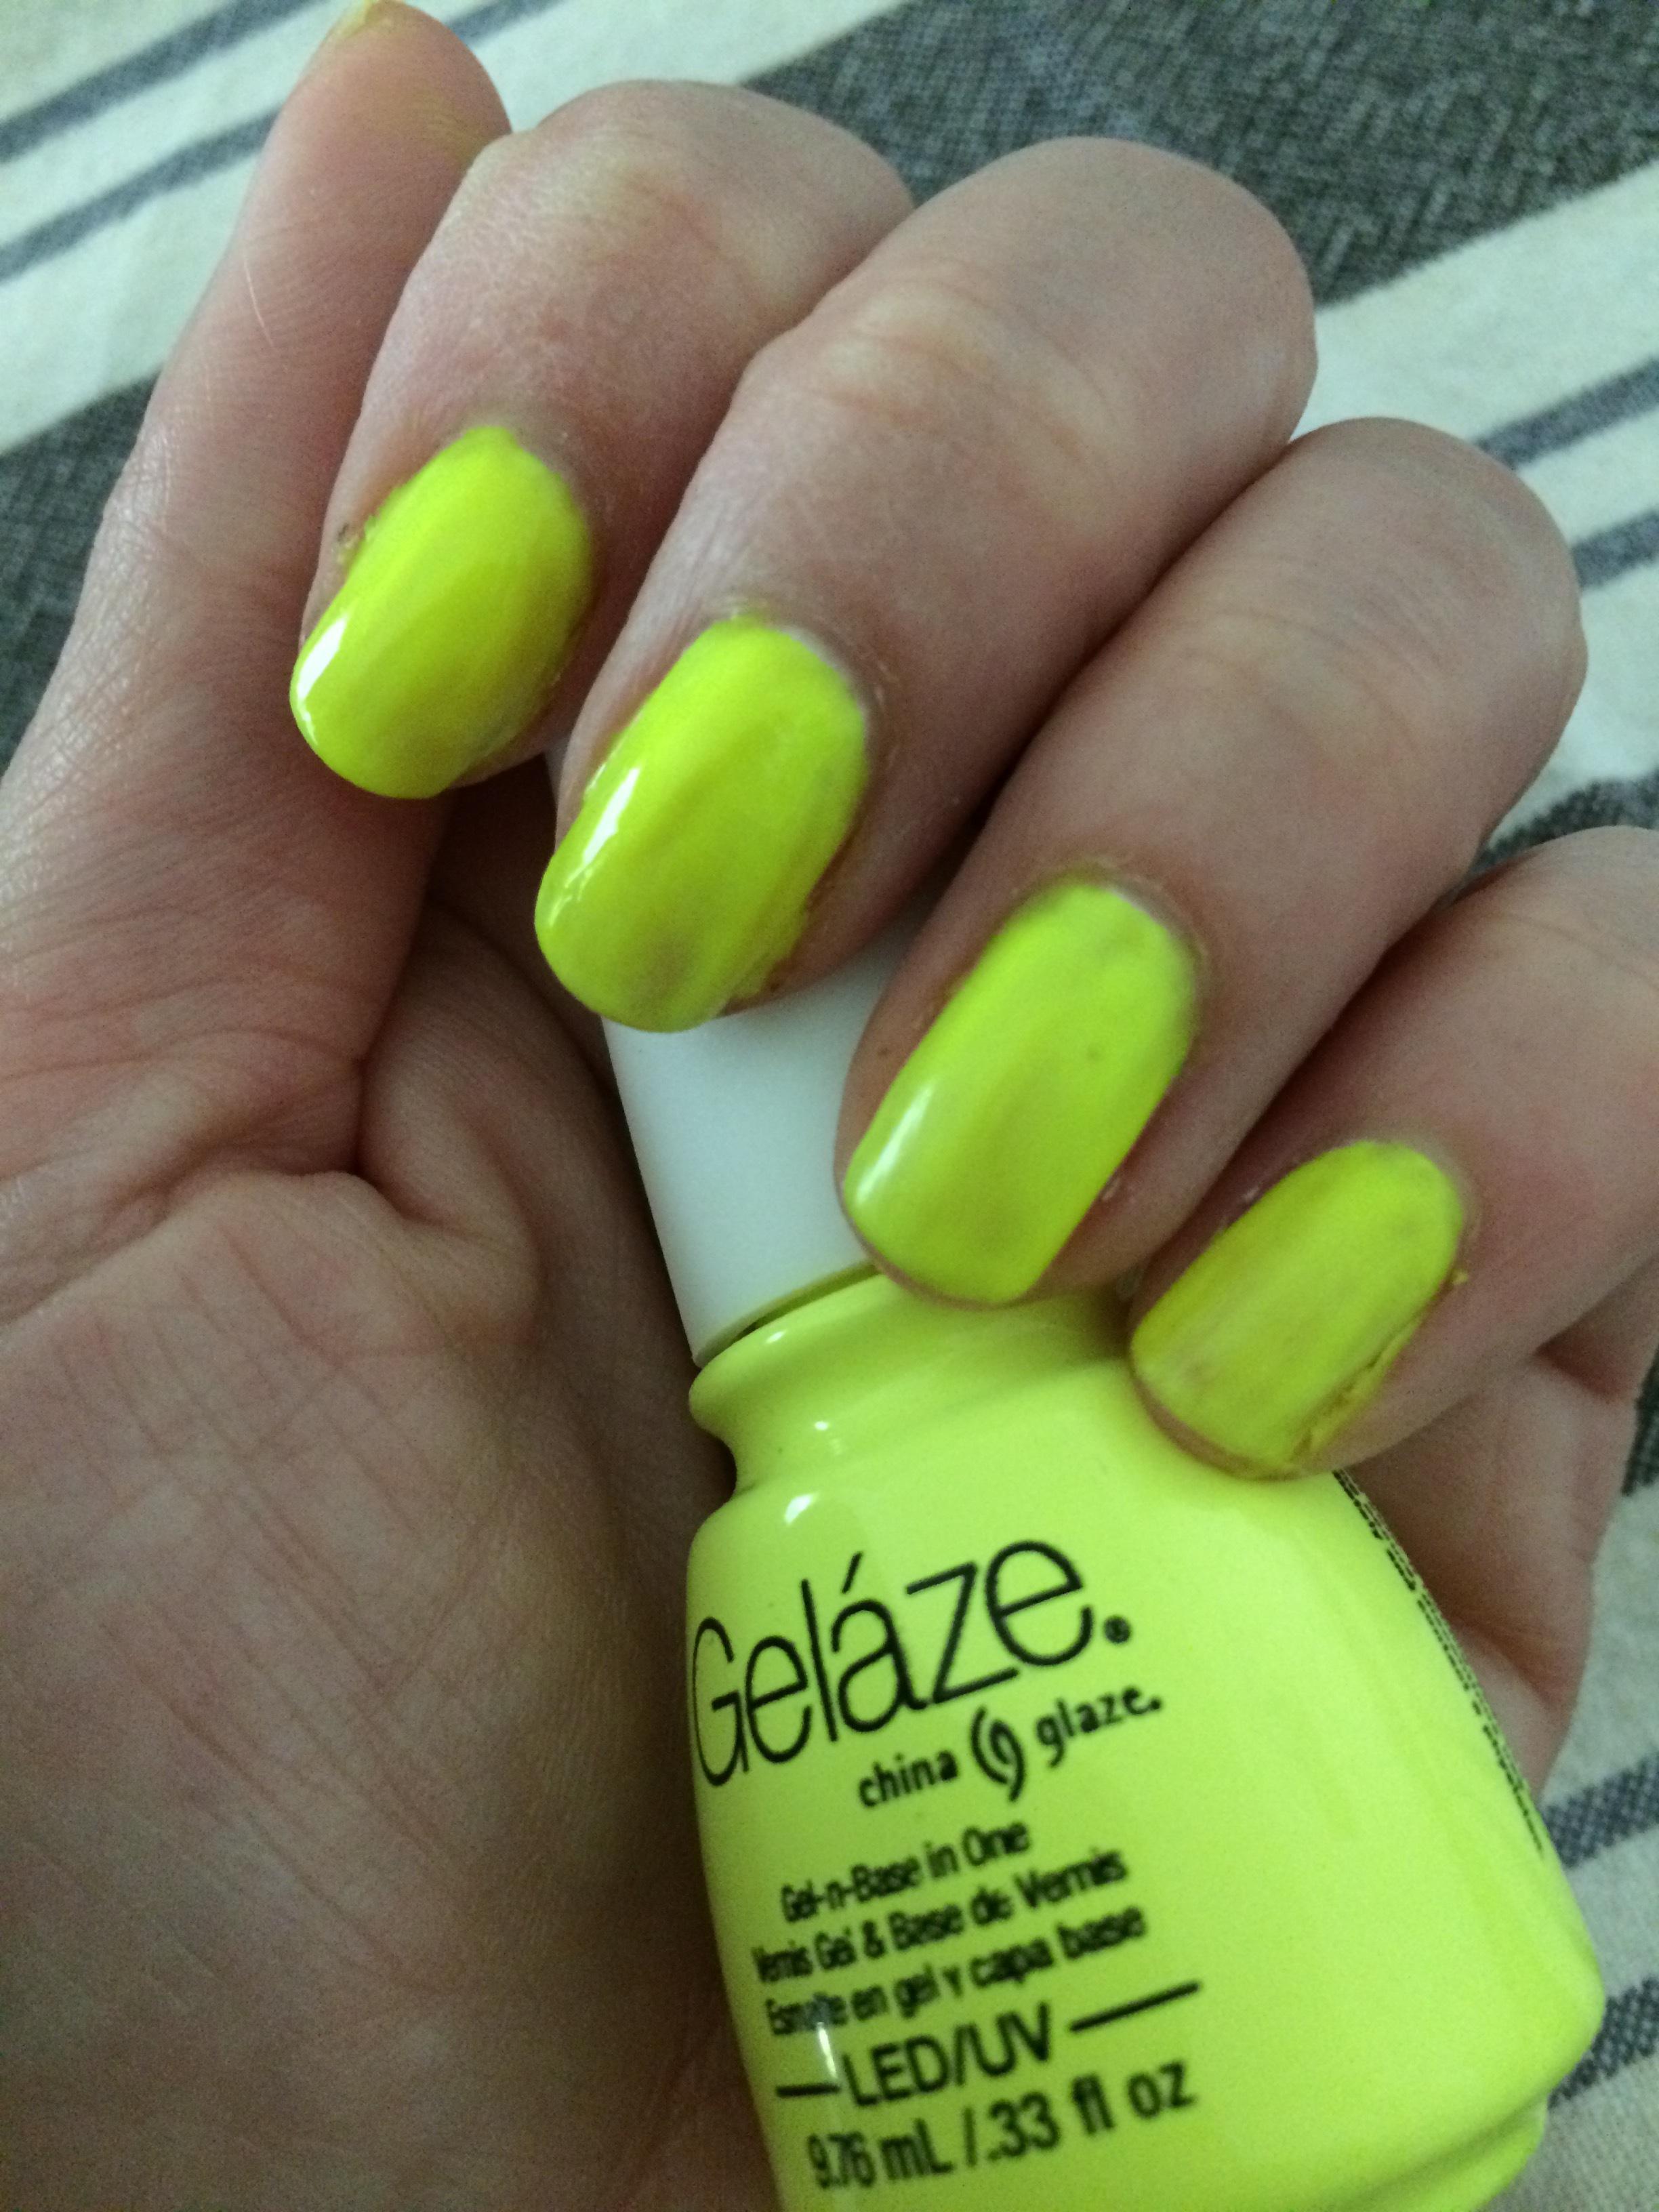 China Glaze Gelaze Gel Polish reviews in Nail Polish - ChickAdvisor